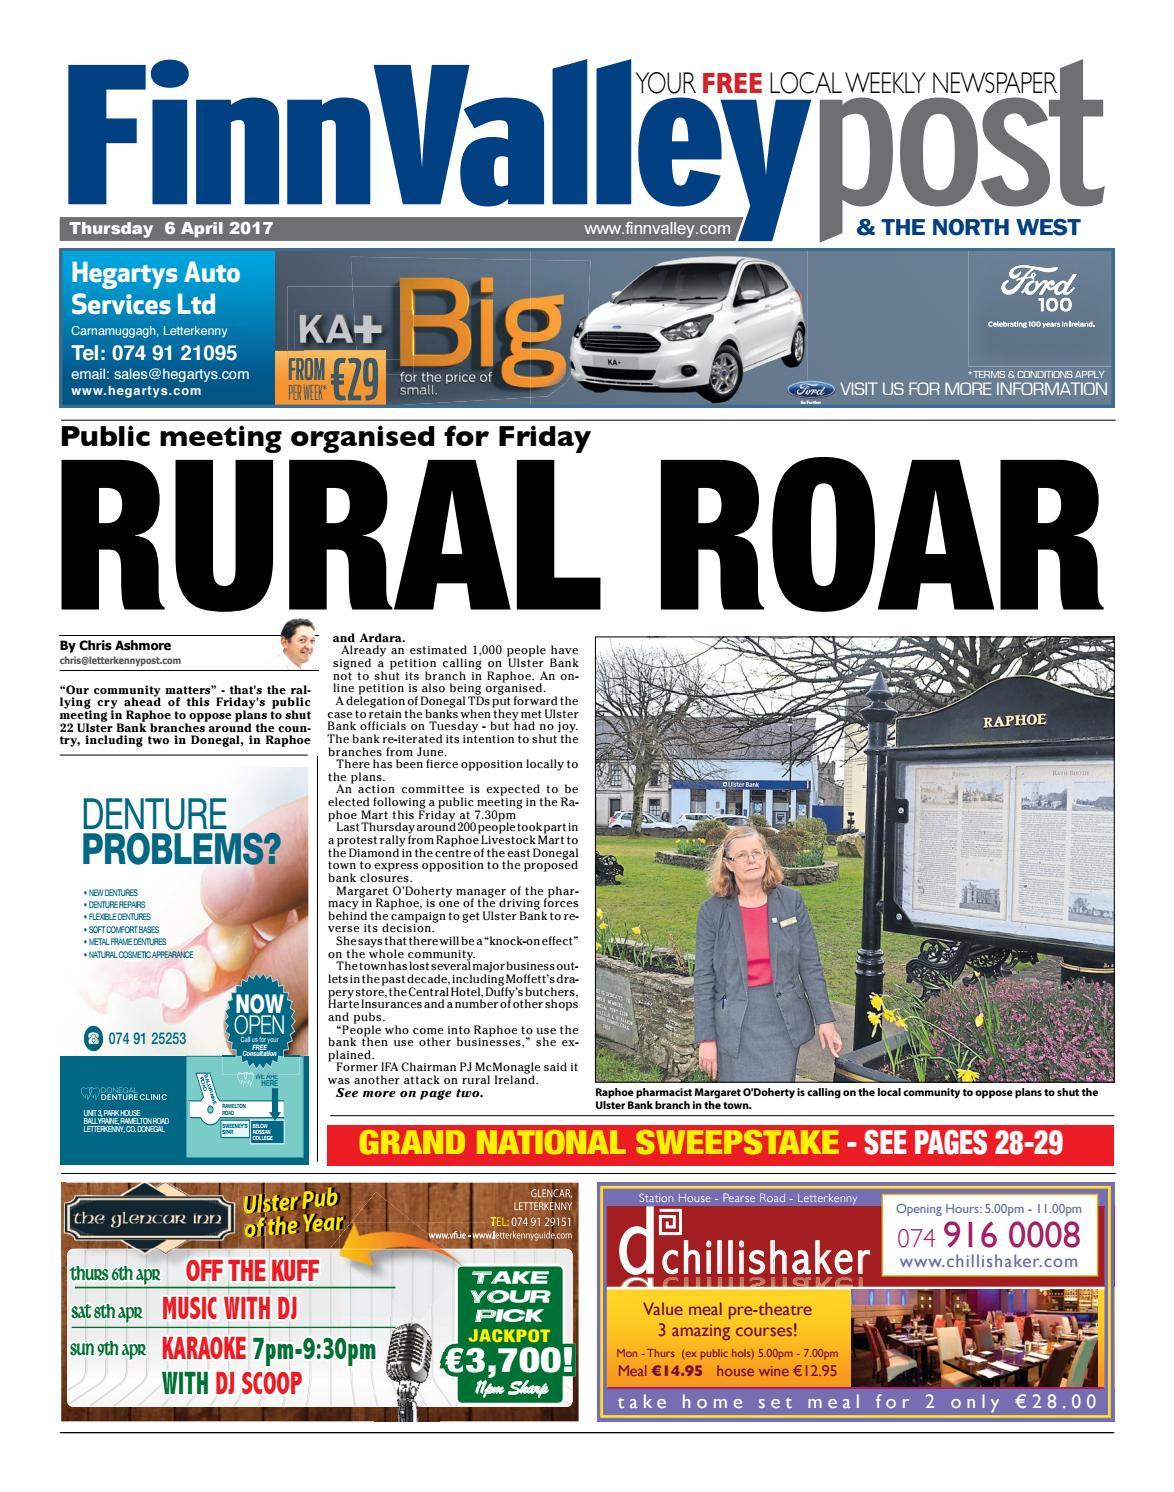 da7b39019aa42 Finn valley post 06 04 17 by River Media Newspapers - issuu